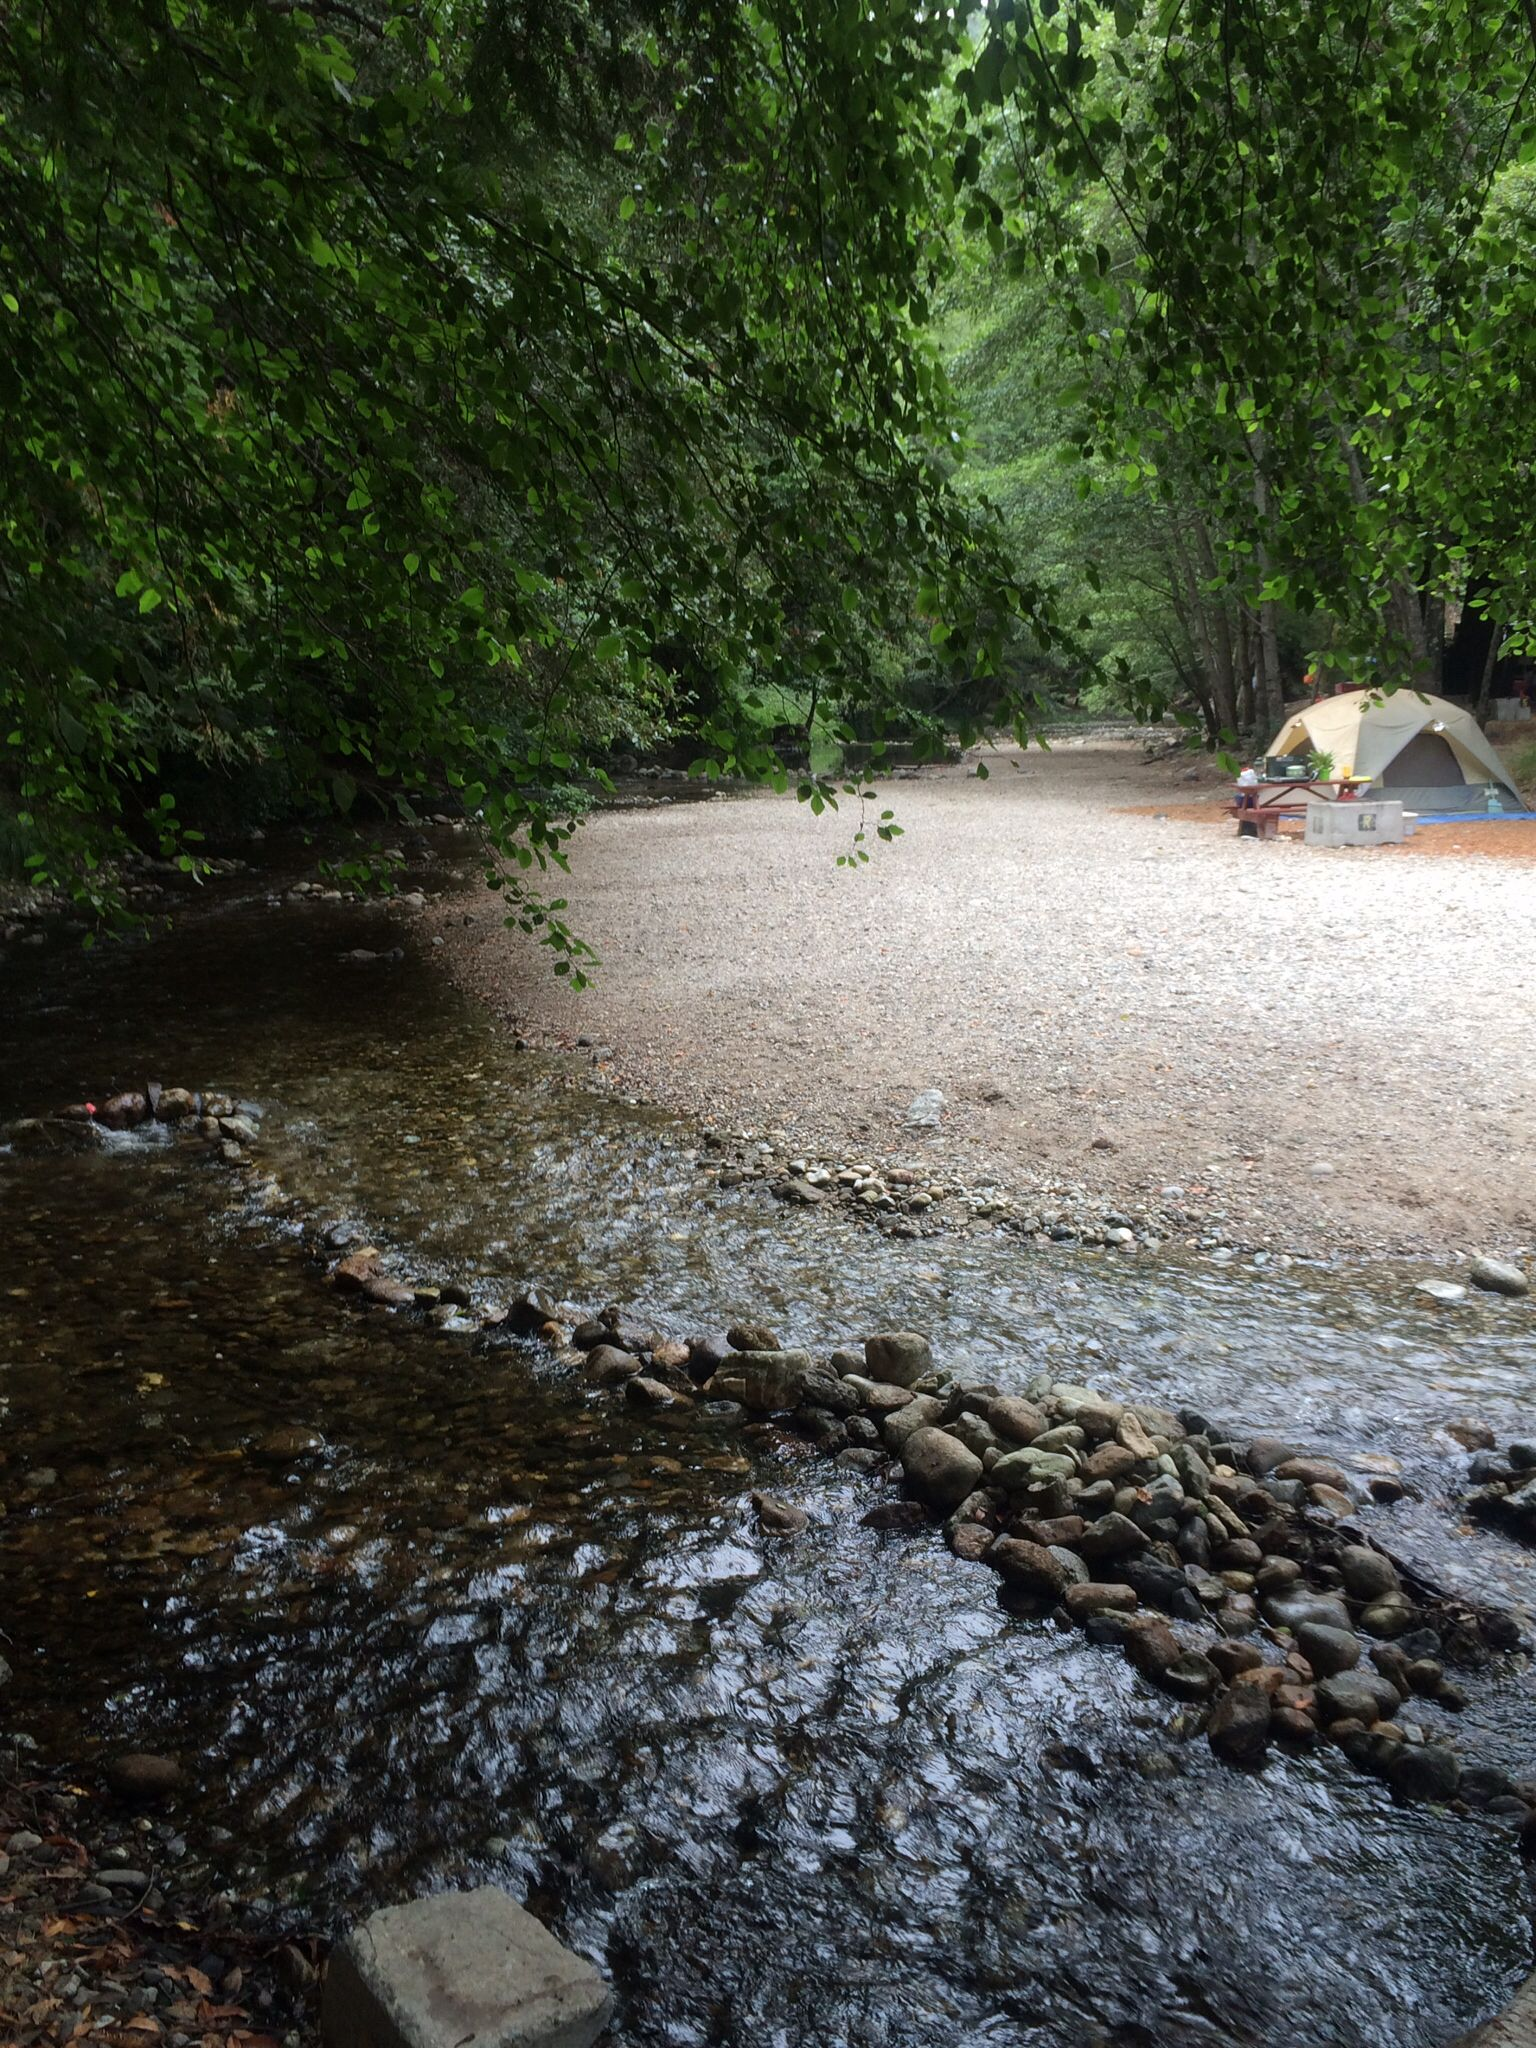 Camp Spot At Riverside Campground In Big Sur Big Sur Camping Pinnacles National Park Big Sur